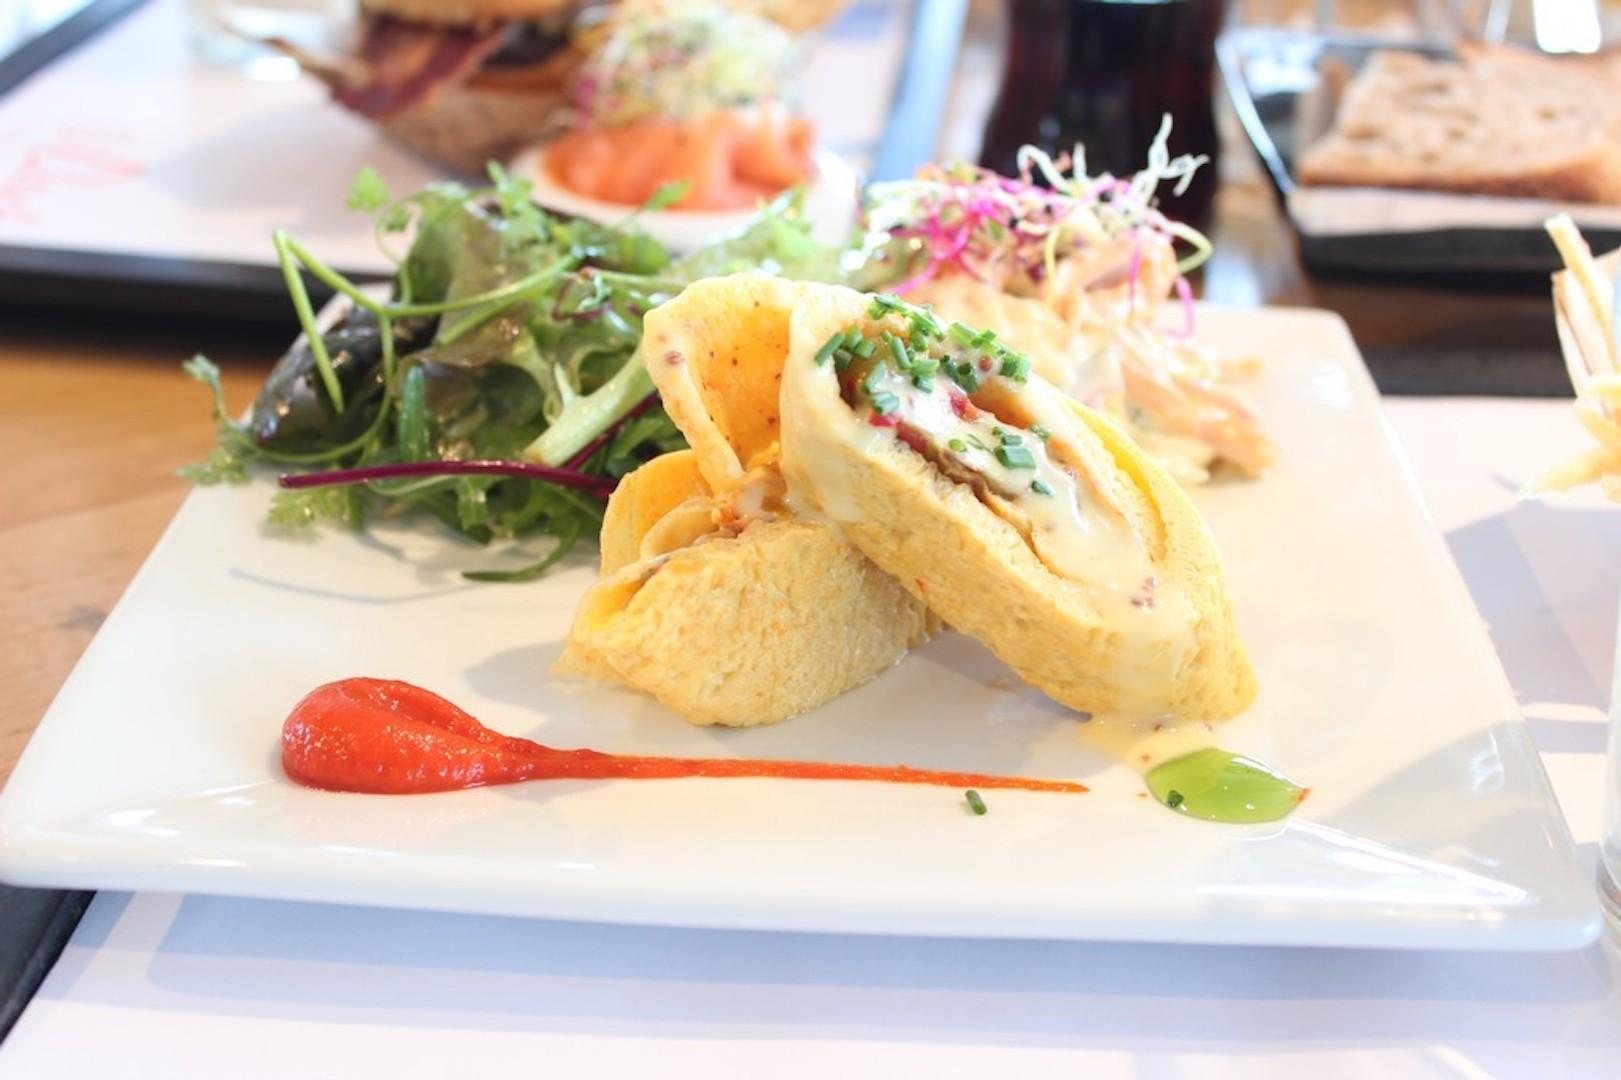 Lifestyle-nunaavane-trips-nantes-brunch-food-bblogger-ctbb2